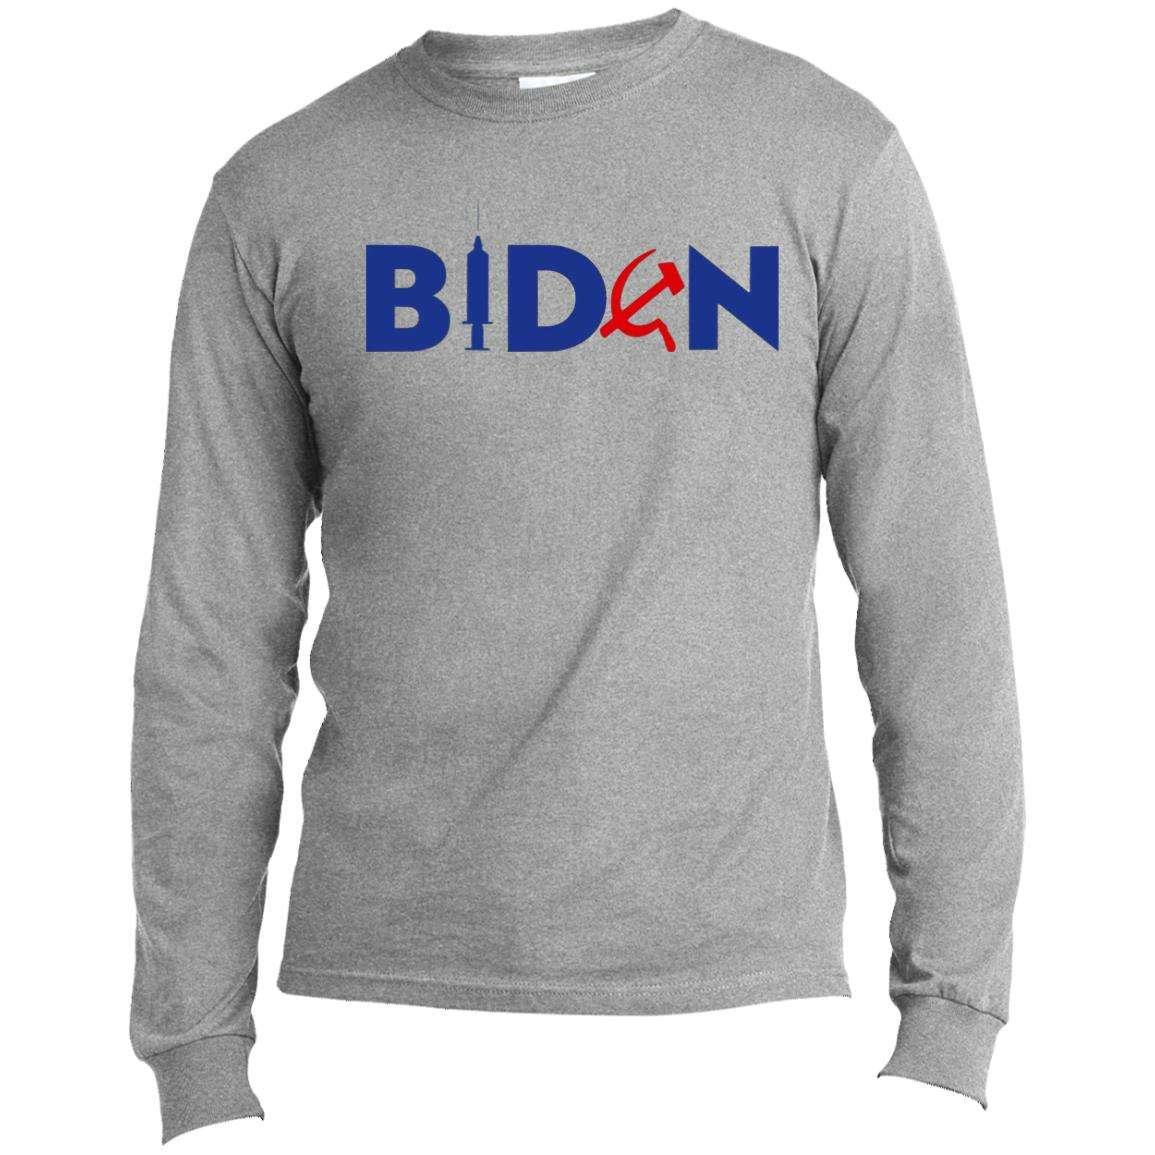 Biden Commie Vaccinator Long Sleeve T-Shirt (4 Variants)